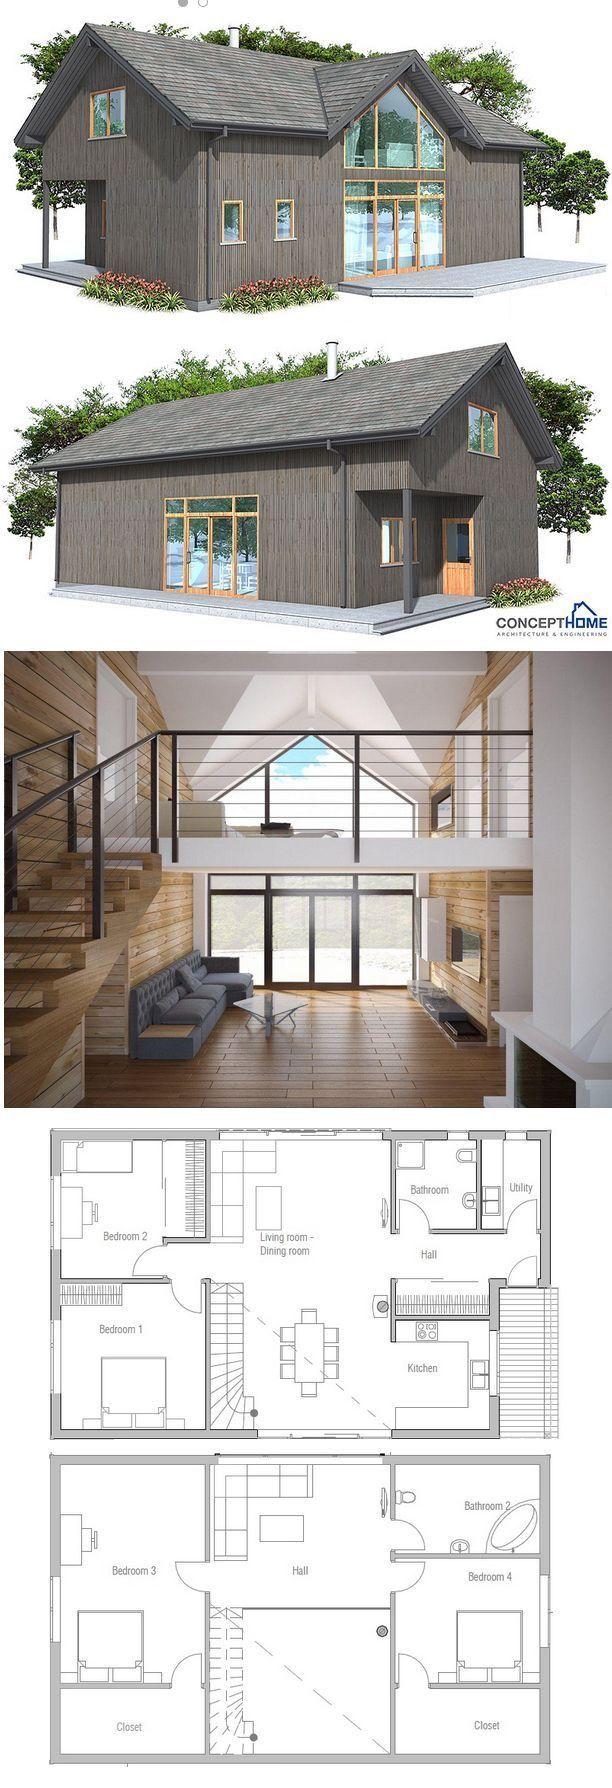 Fascinating Loft House Plans Modern Ranch Style Courtyard Home Floor Best Plan Perky